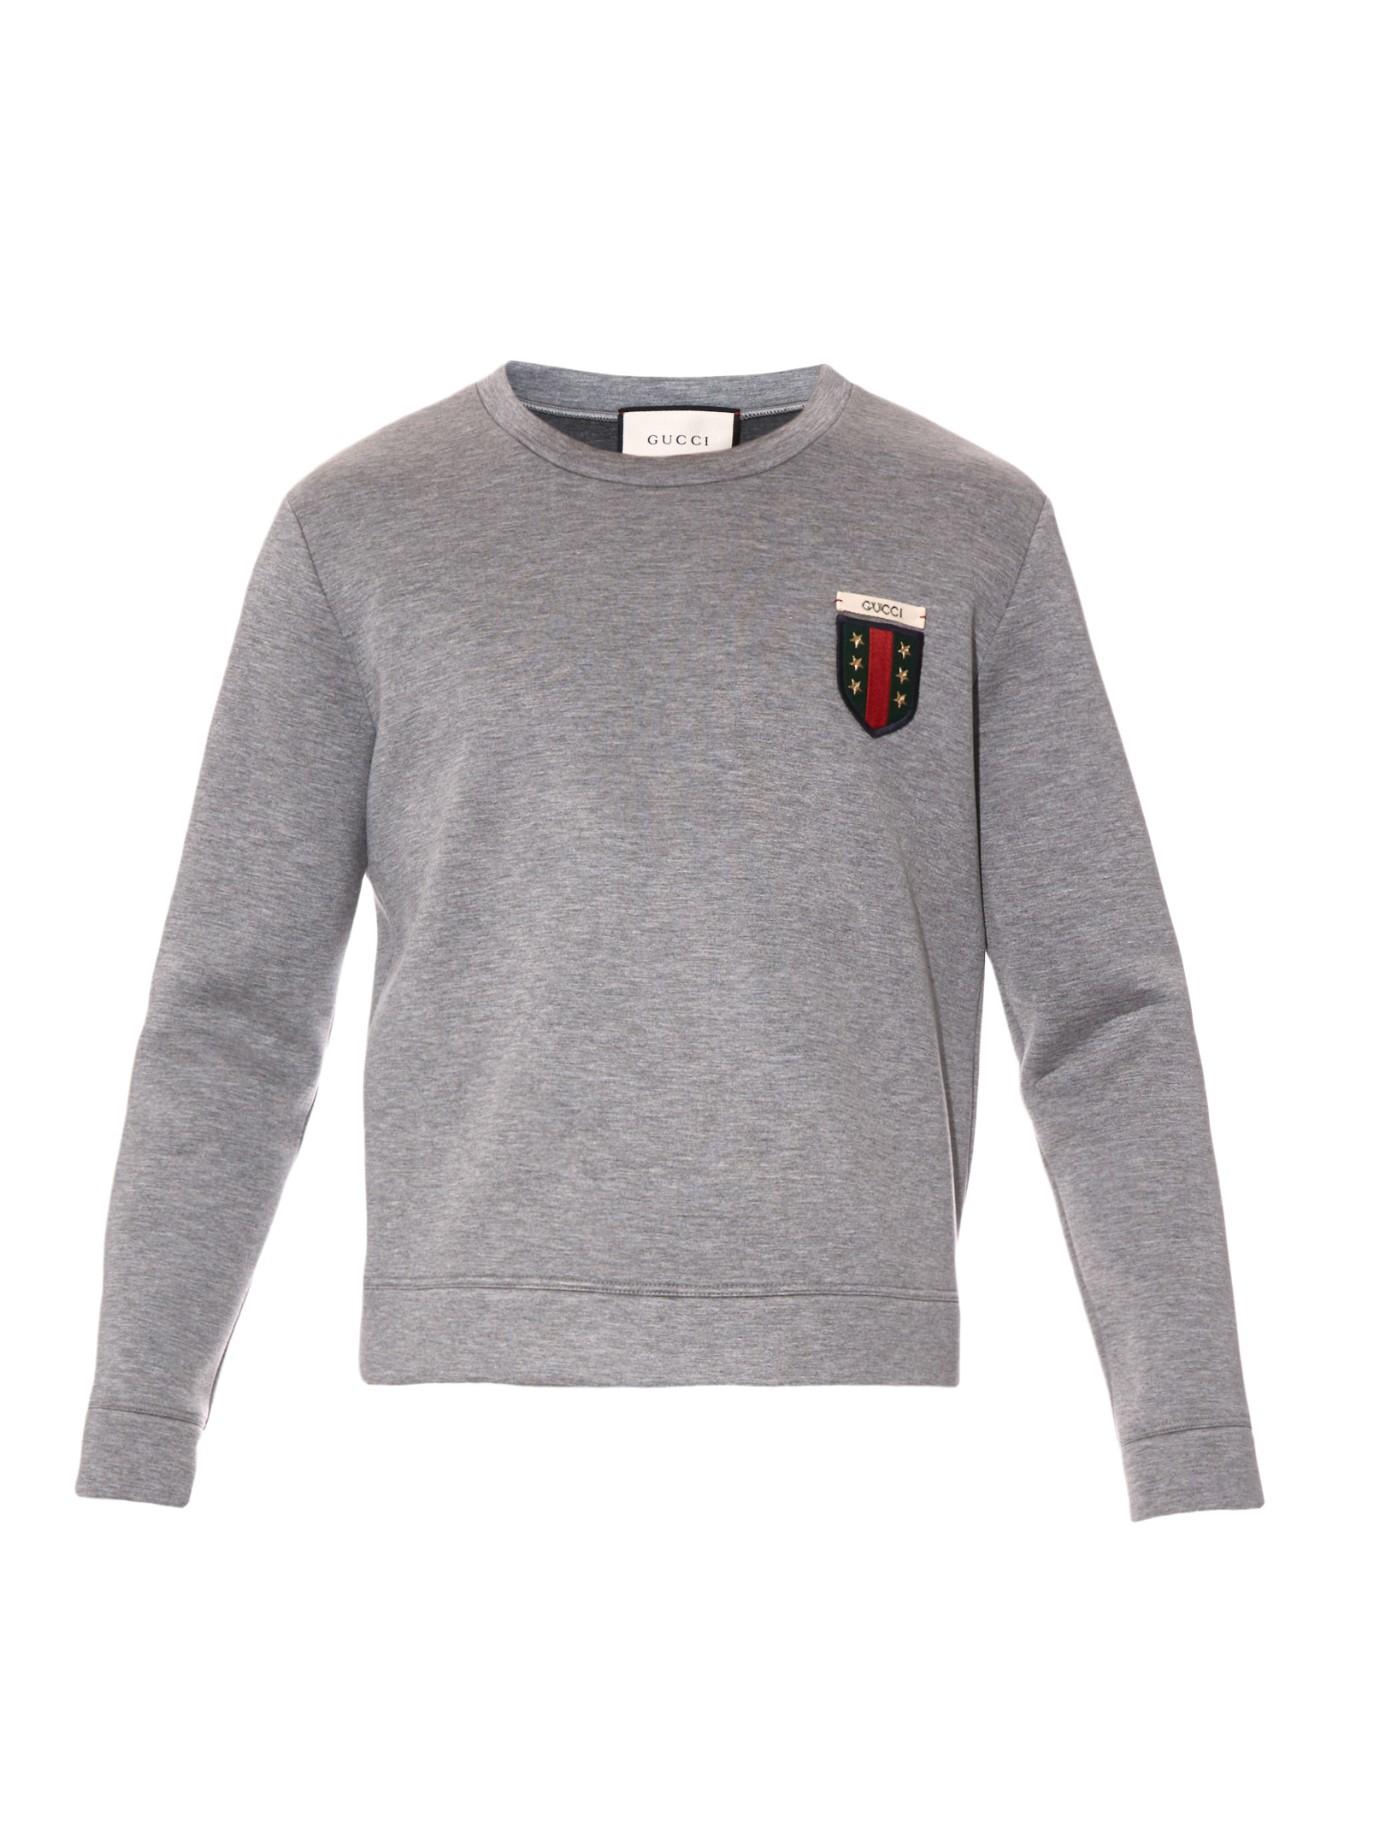 a2dbe0b77d8 Lyst - Gucci Crew-neck Neoprene Sweatshirt in Gray for Men